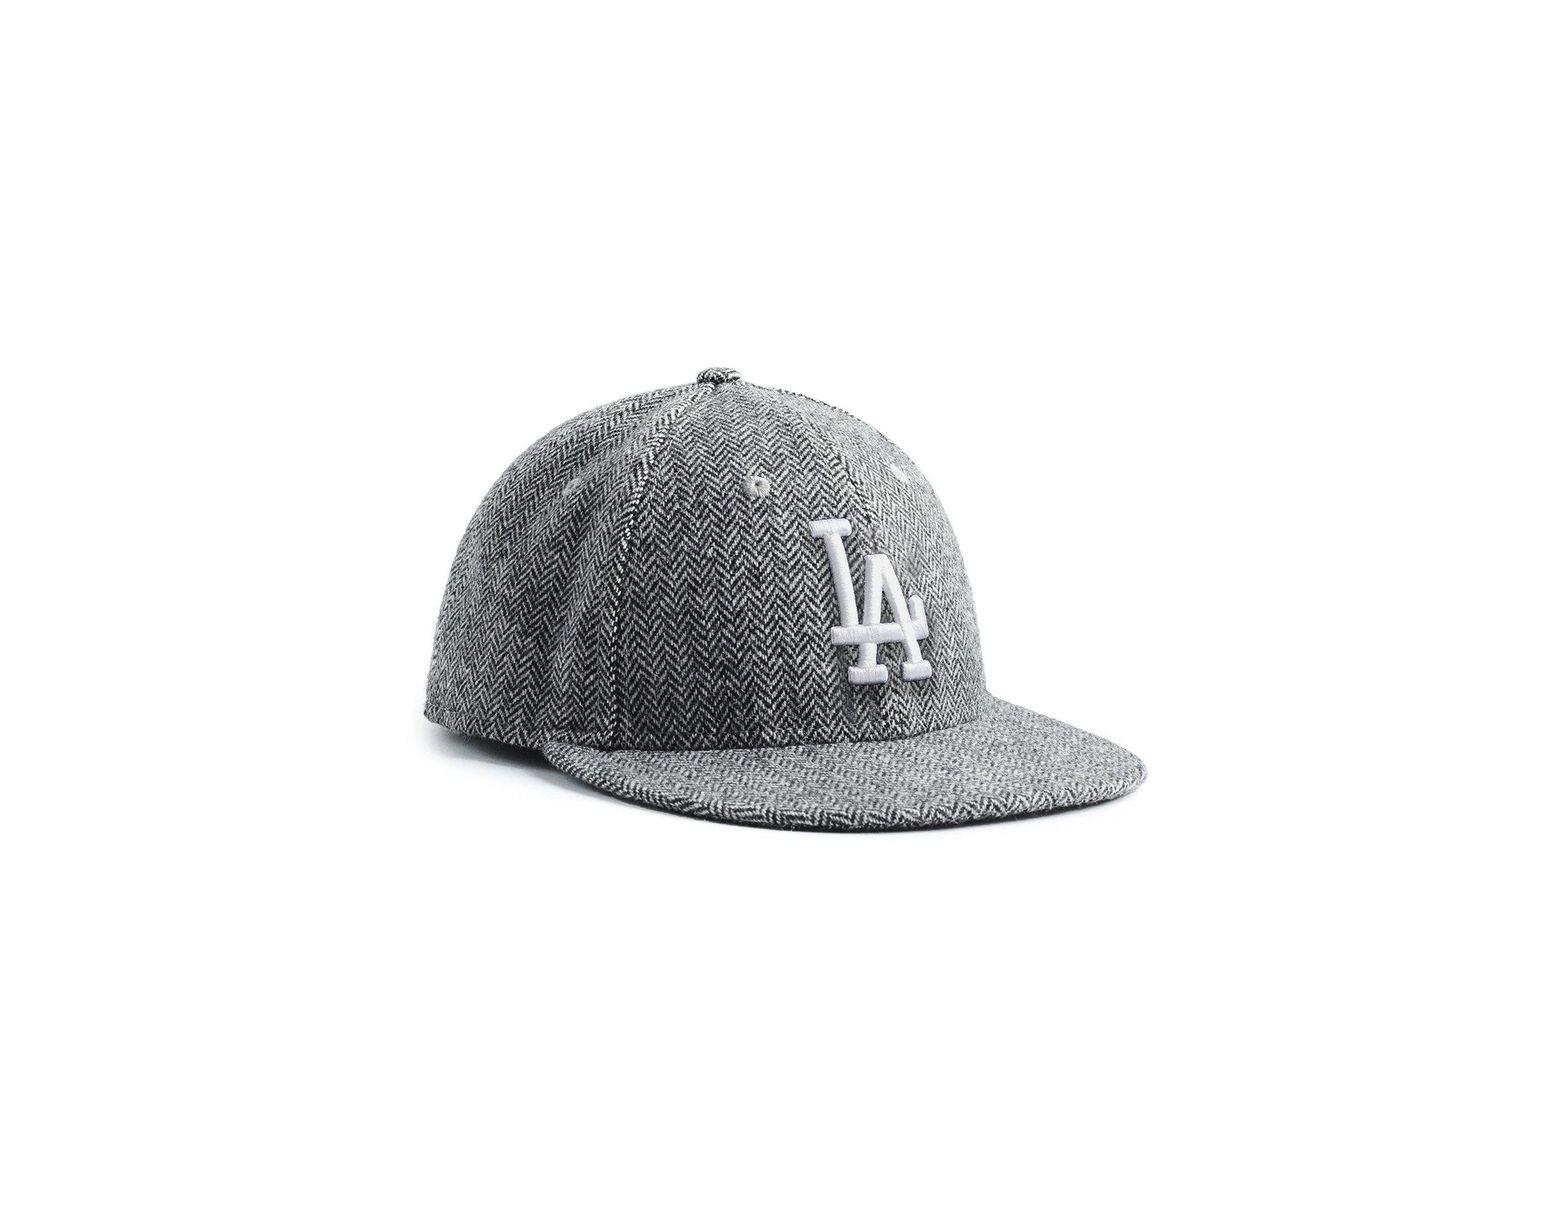 cc1abb85f NEW ERA HATS Exclusive New Era La Dodgers Hat In Abraham Moon Herringbone  Lambswool in Black for Men - Lyst